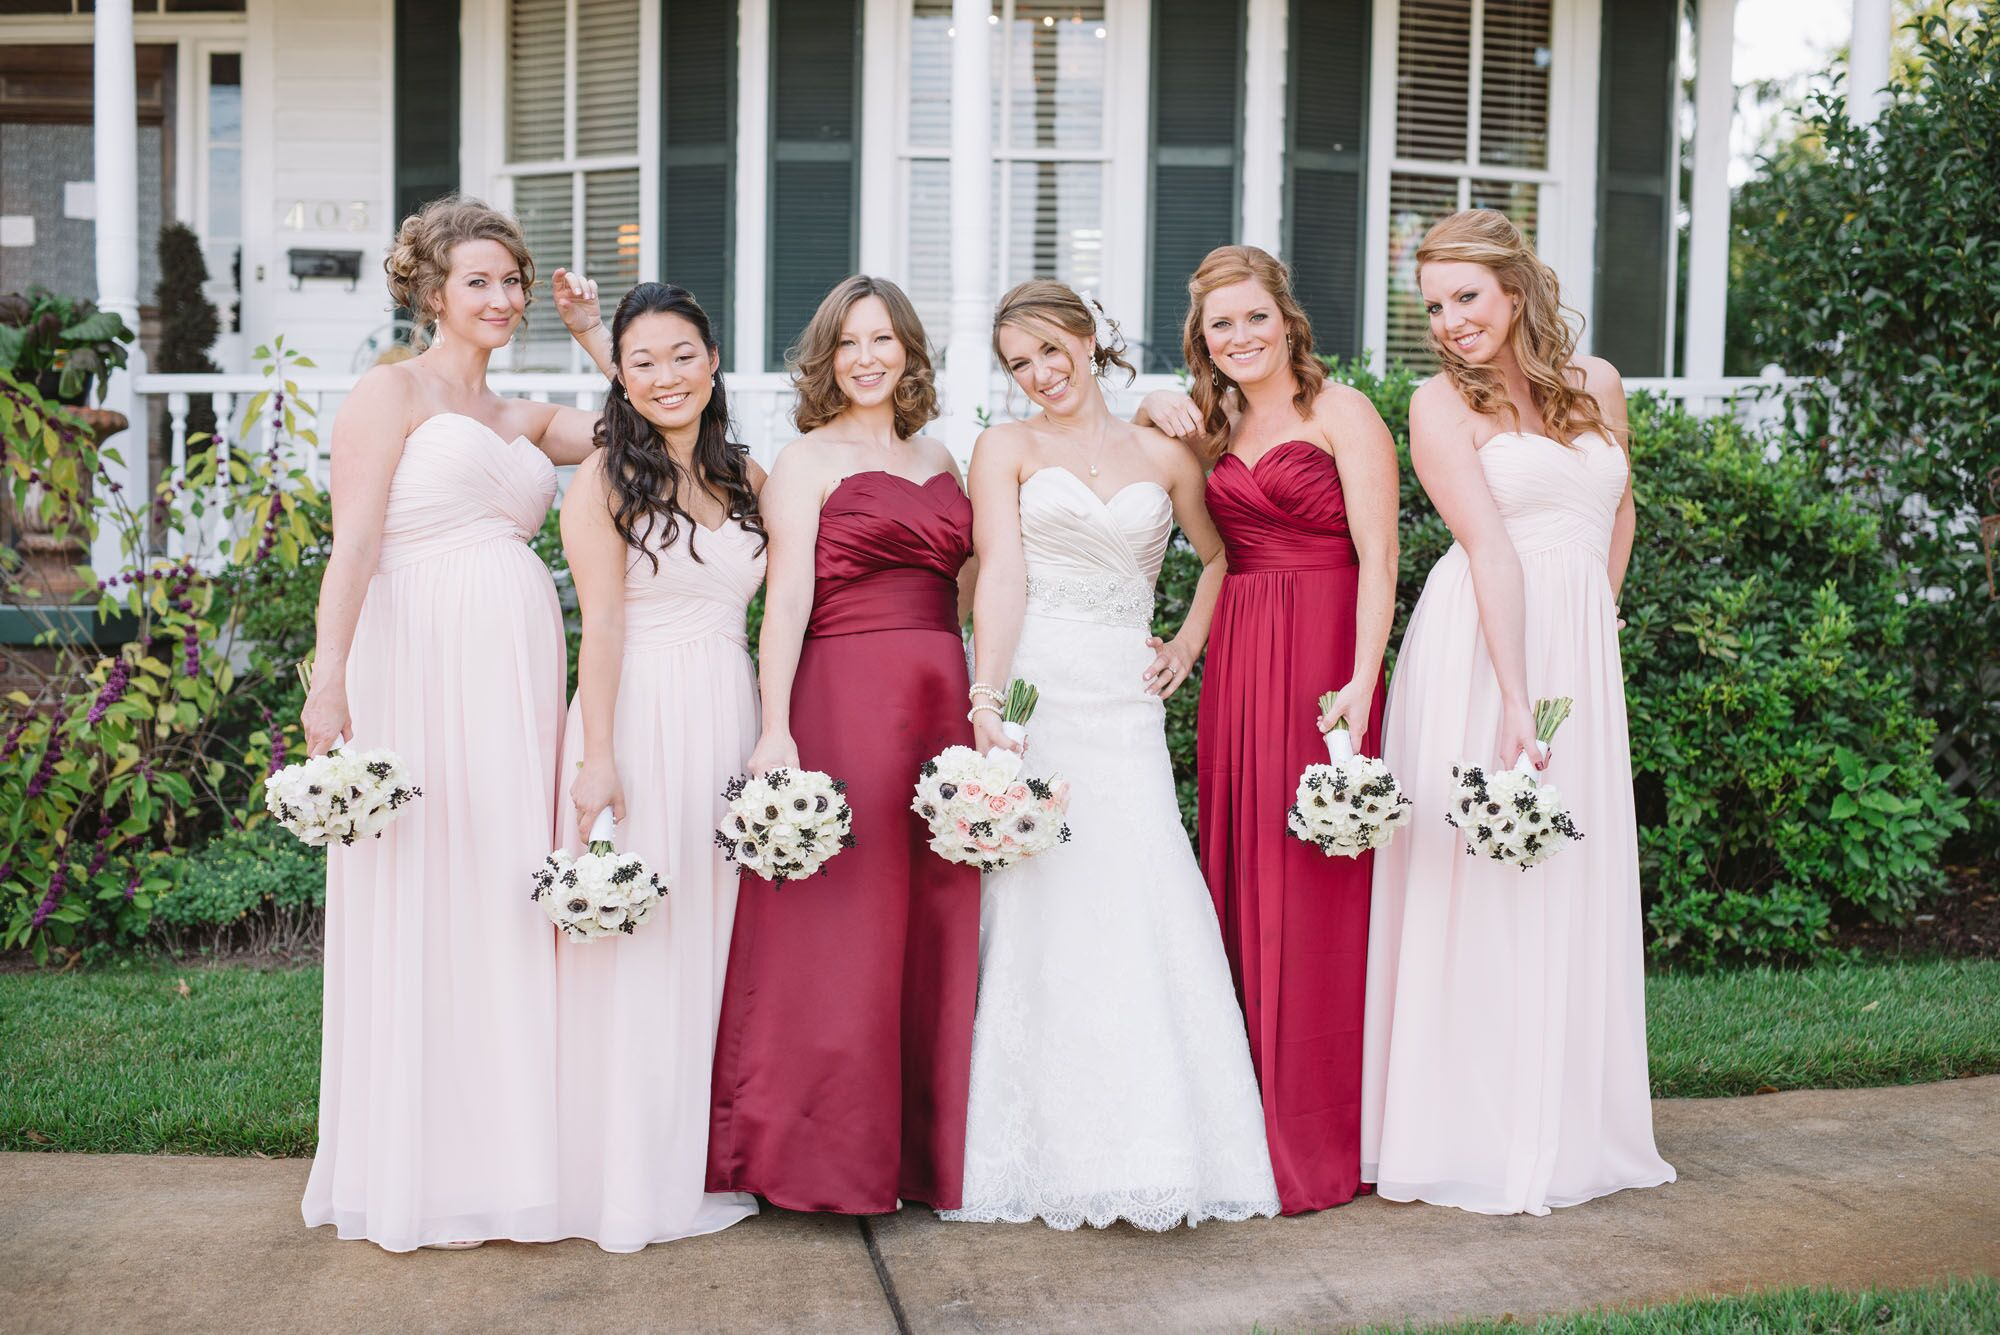 Mixed Burgundy And Blush Bridesmaid Dresses